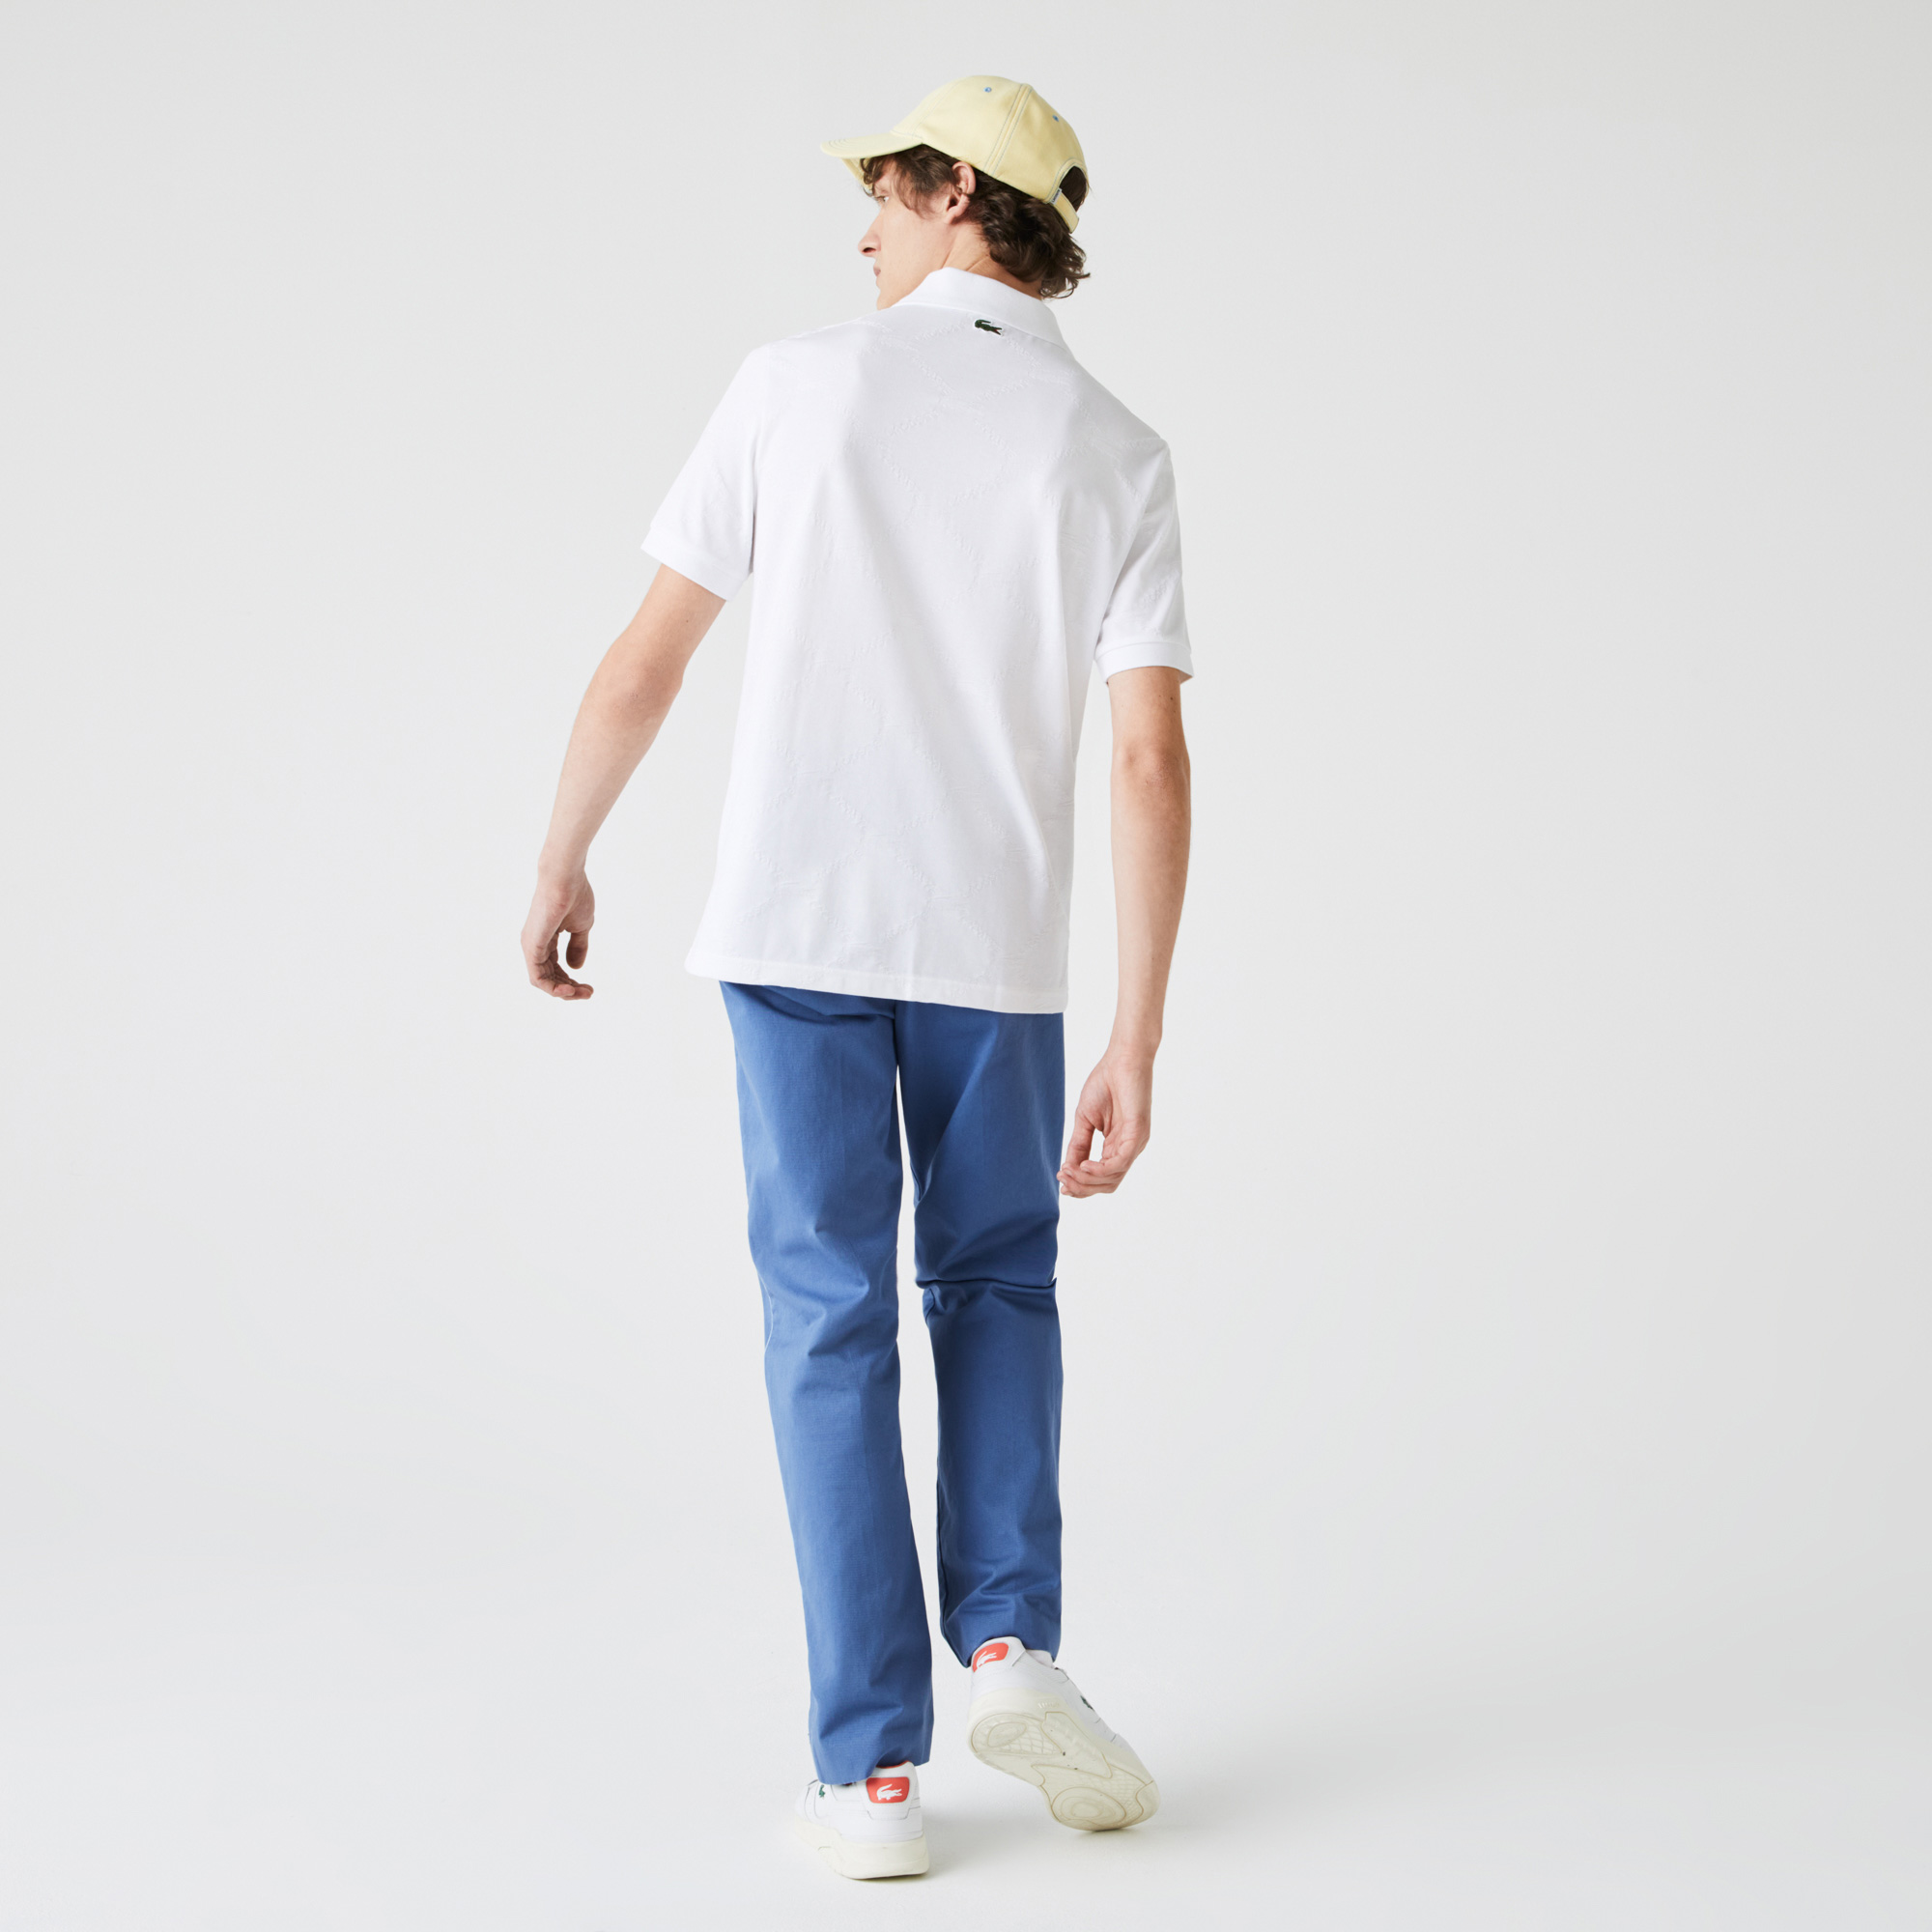 Lacoste Men's Lacoste LIVE Standard Fit Monogram Patterned Polo Shirt